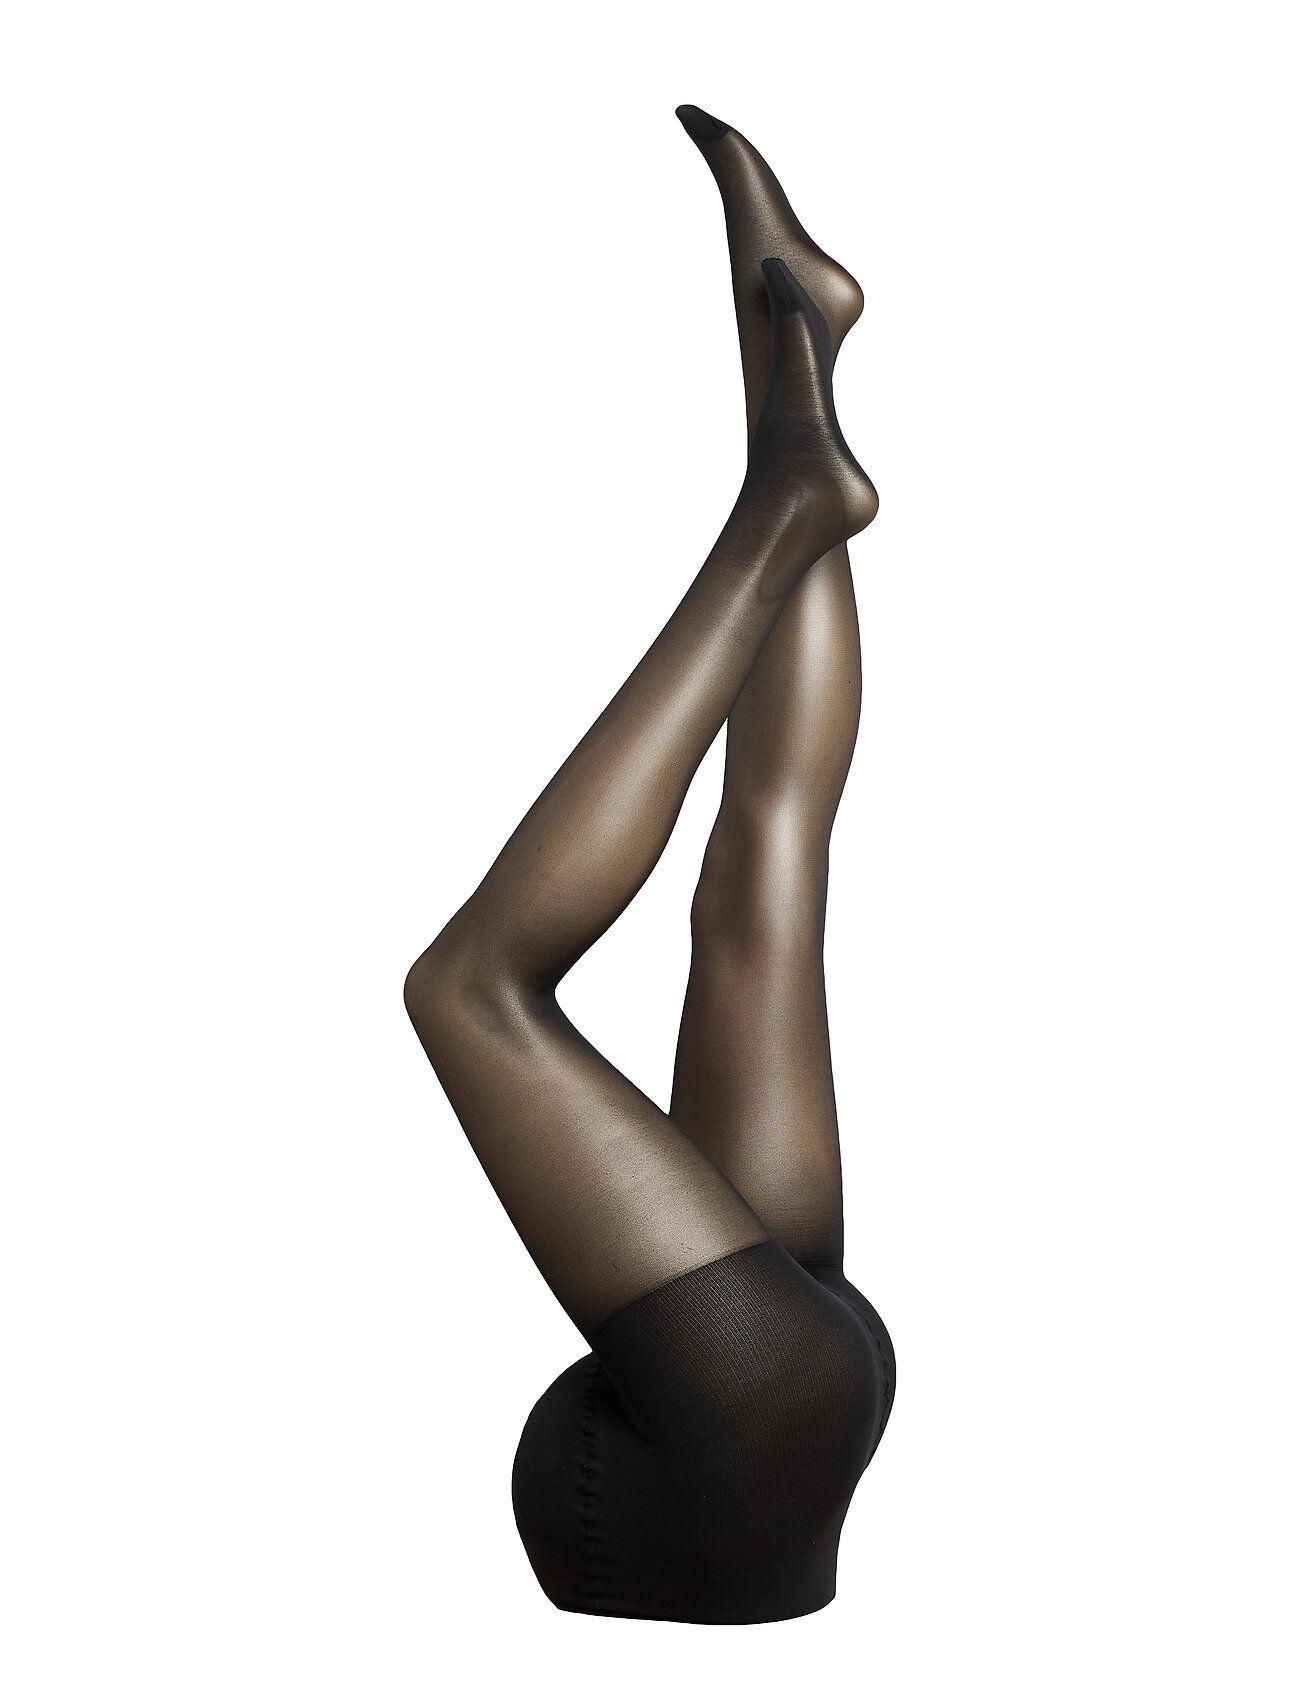 Boob Maternity Compression Tights Lingerie Bras & Tops Pantyhose Musta Boob